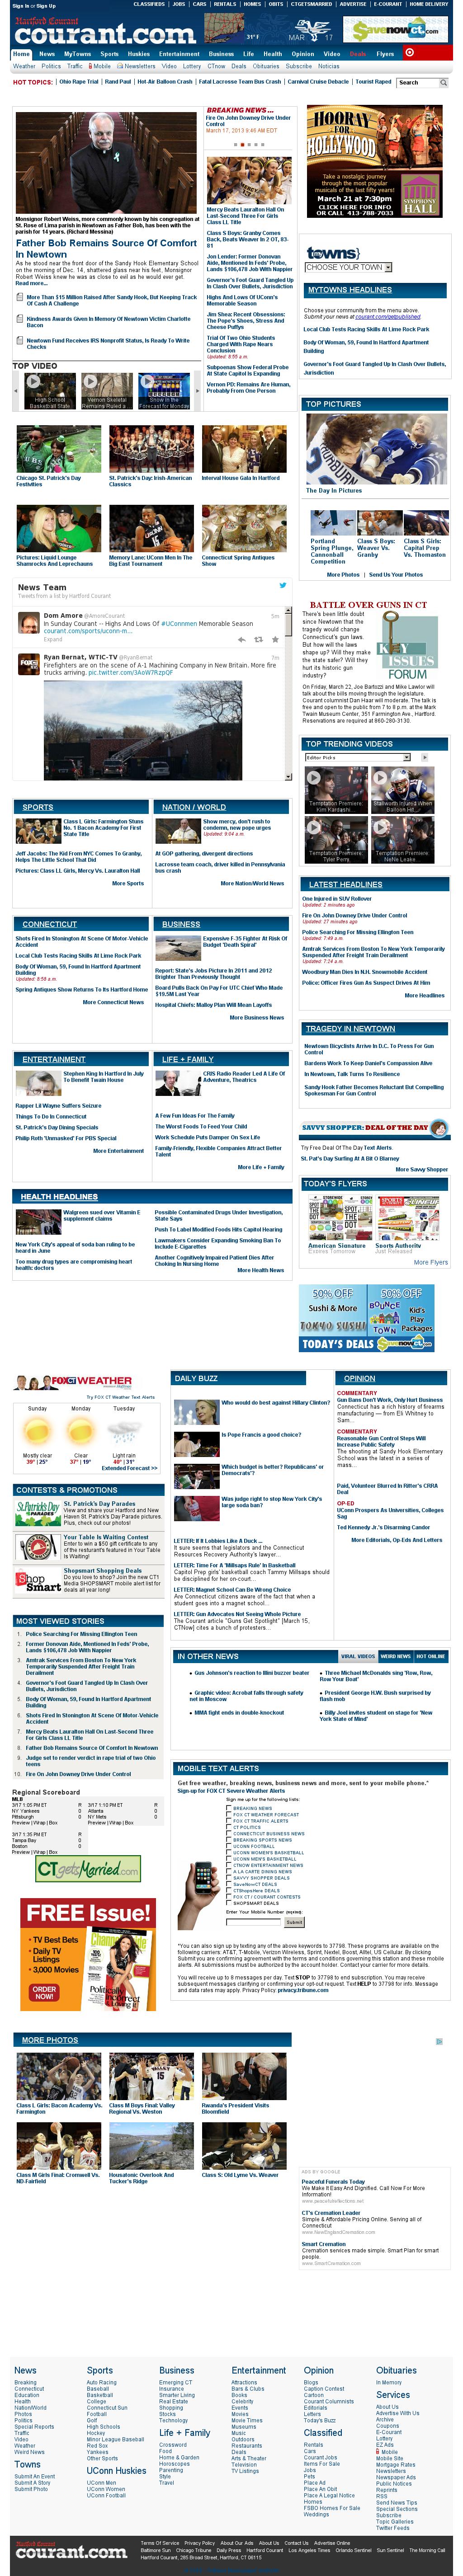 Hartford Courant at Sunday March 17, 2013, 2:12 p.m. UTC